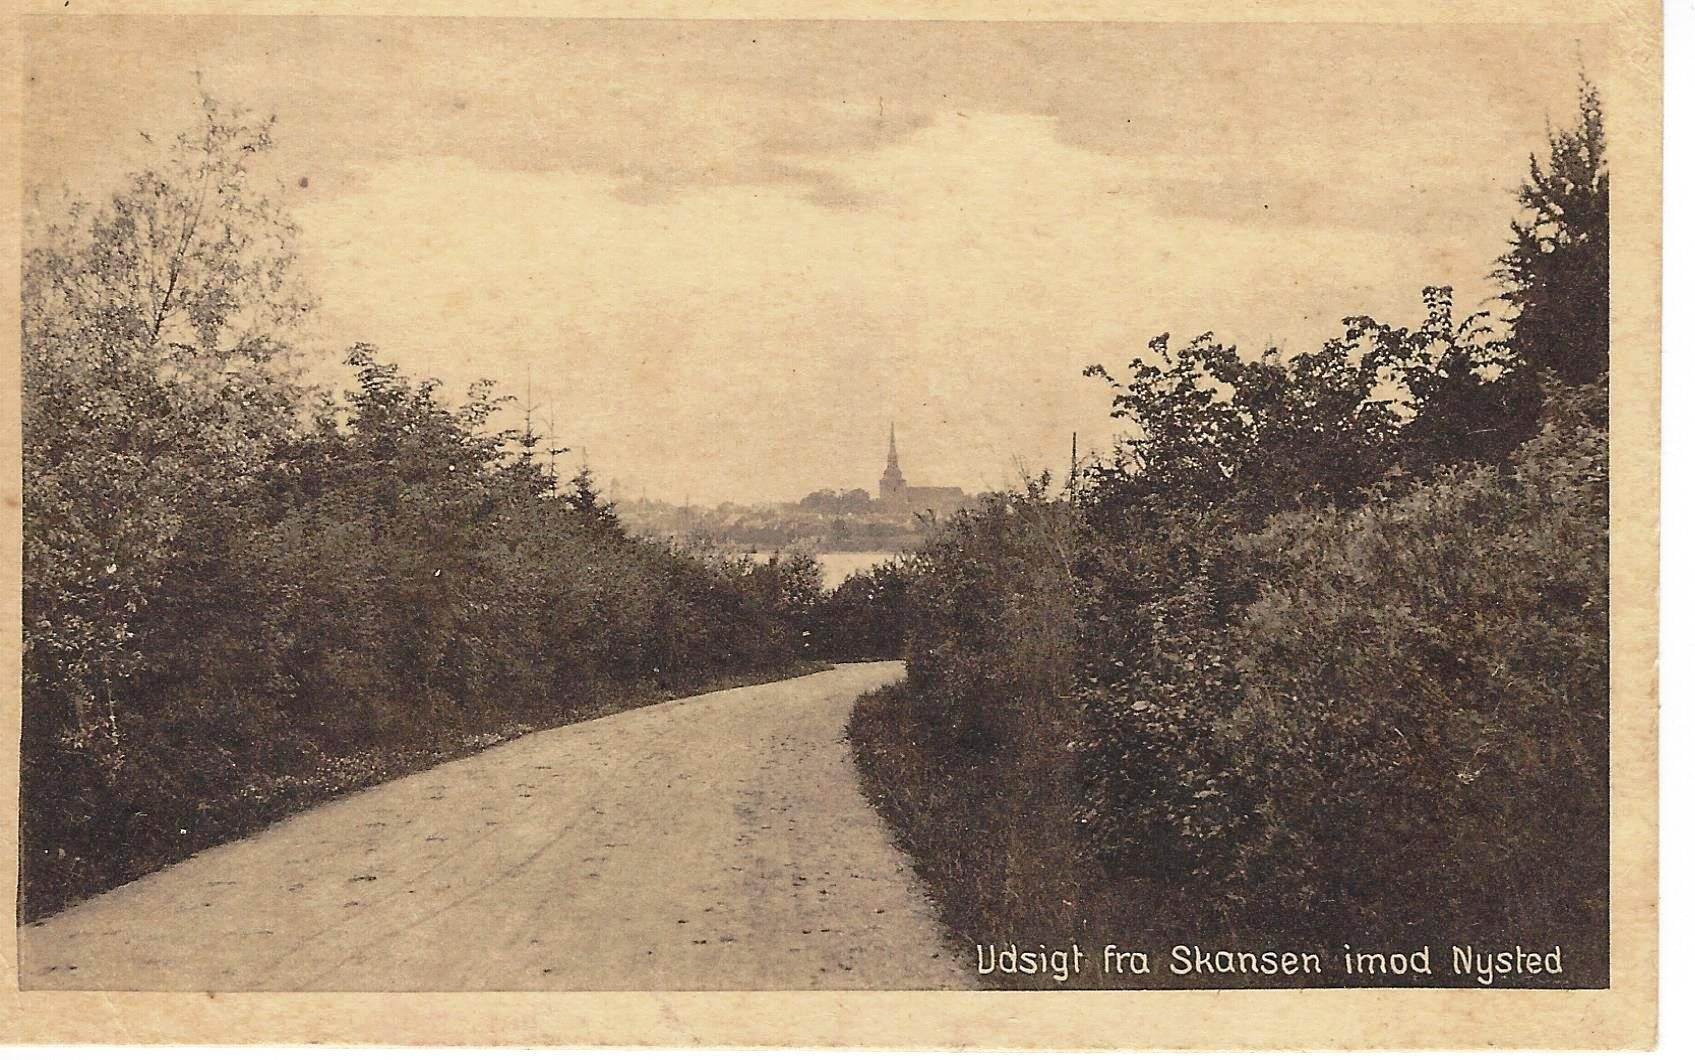 06-Skanseanlægget-1917-02